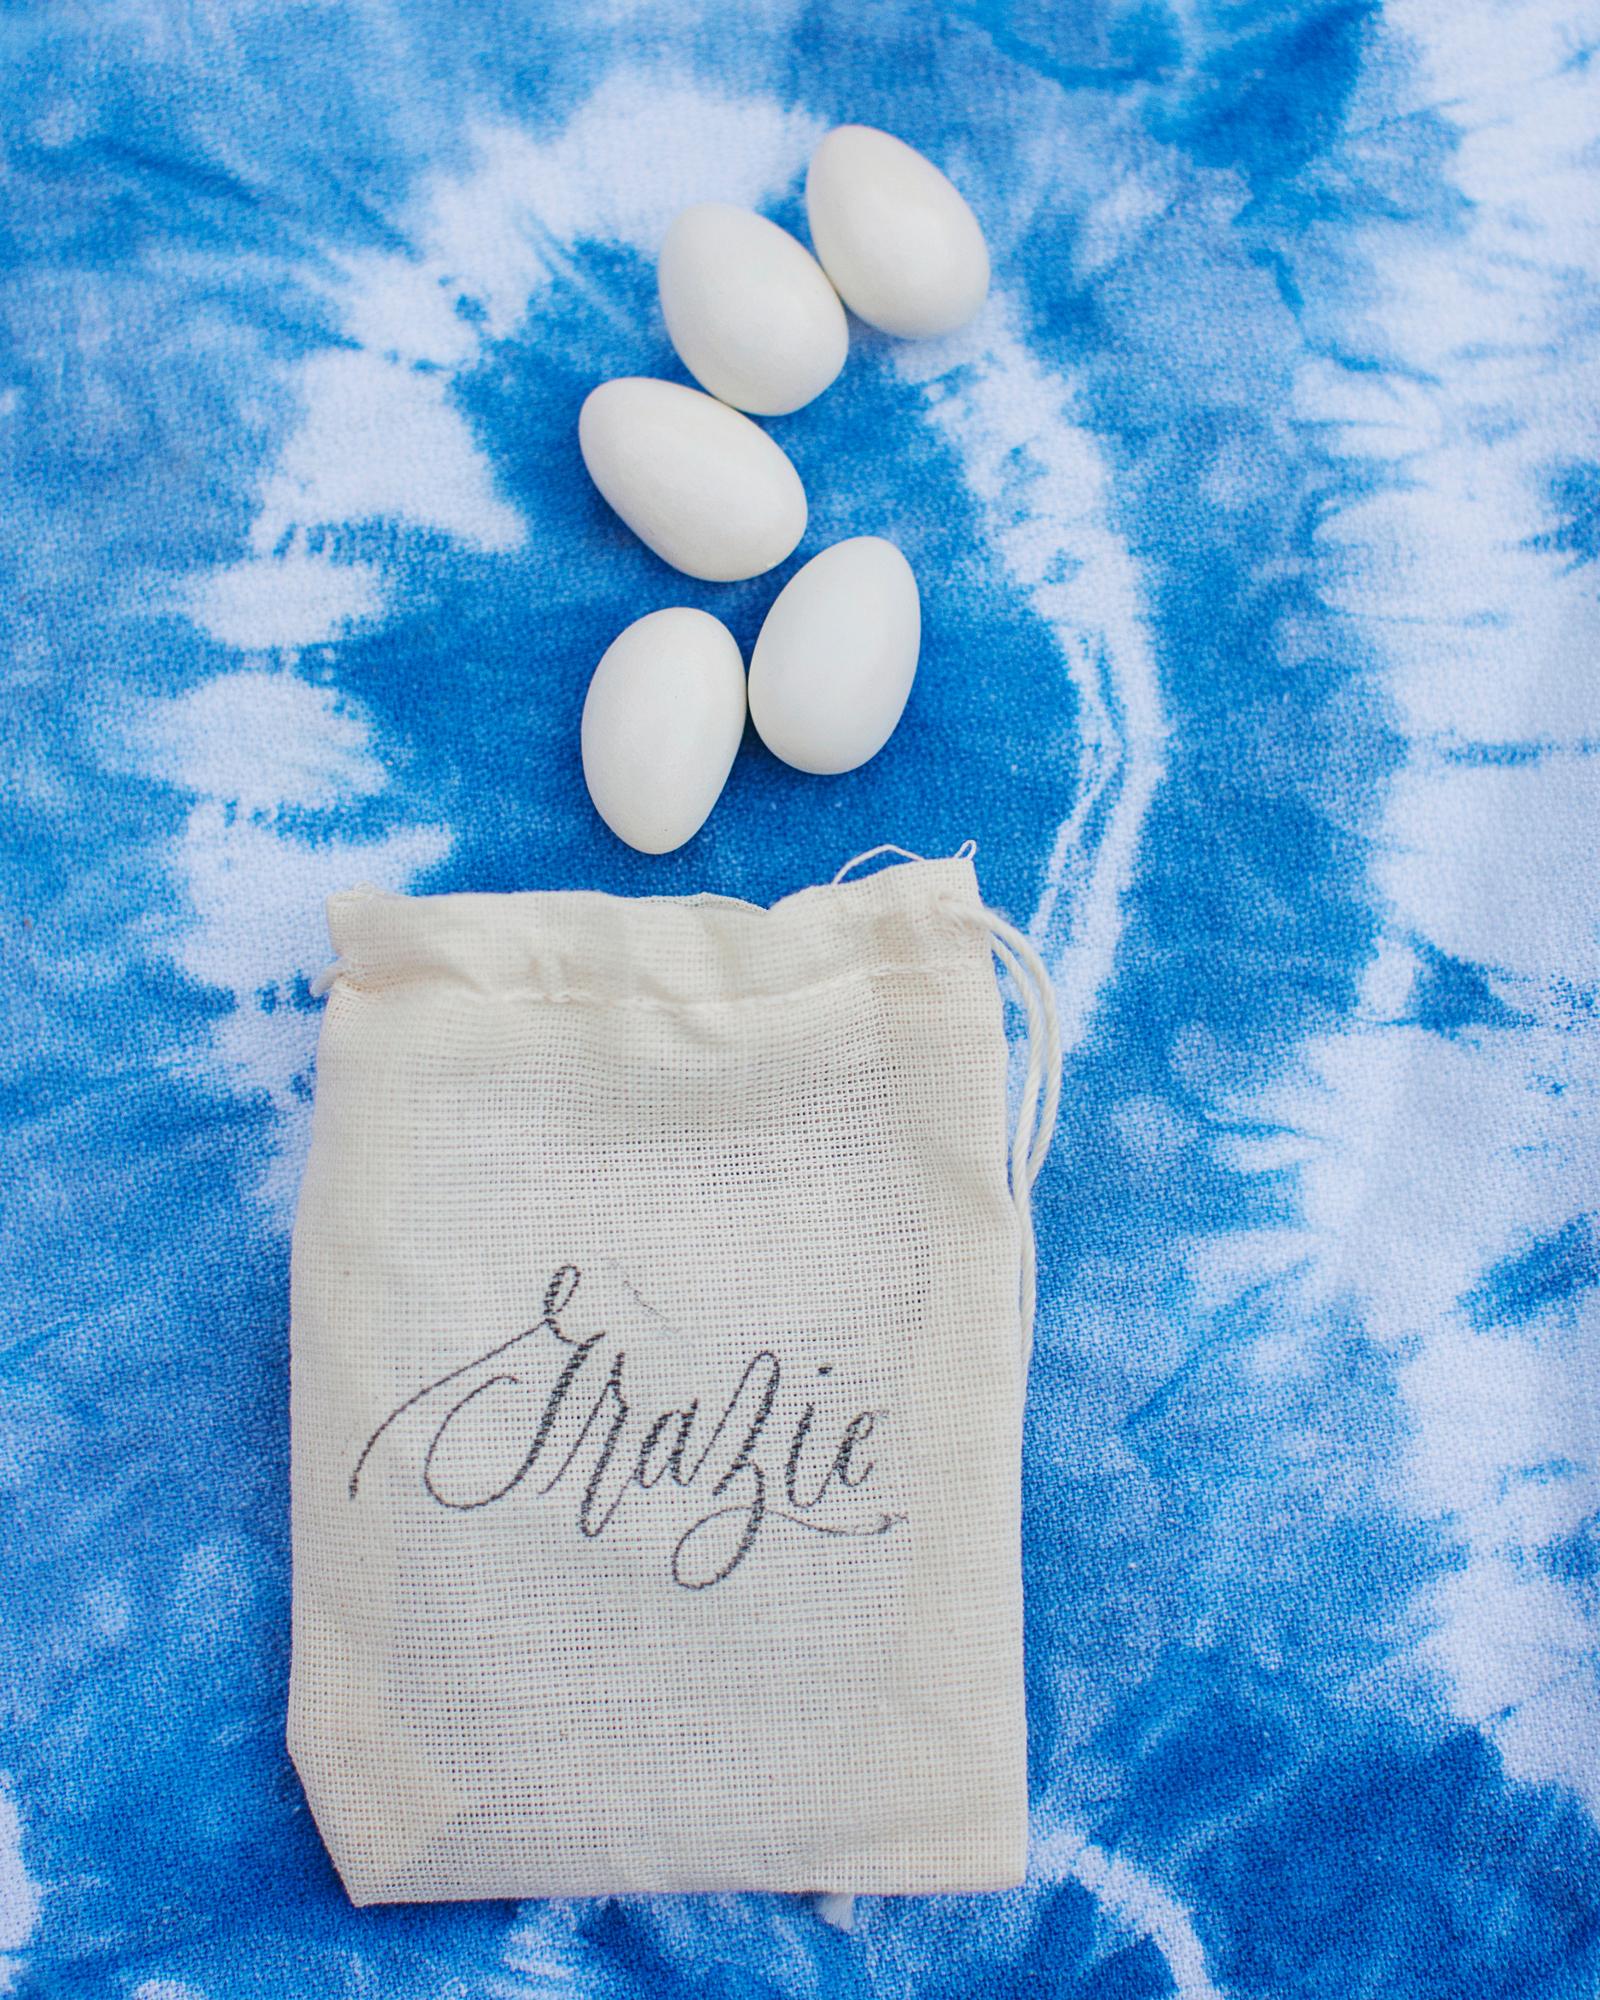 rosie-ambi-wedding-dragees-5874-s112501-0116.jpg